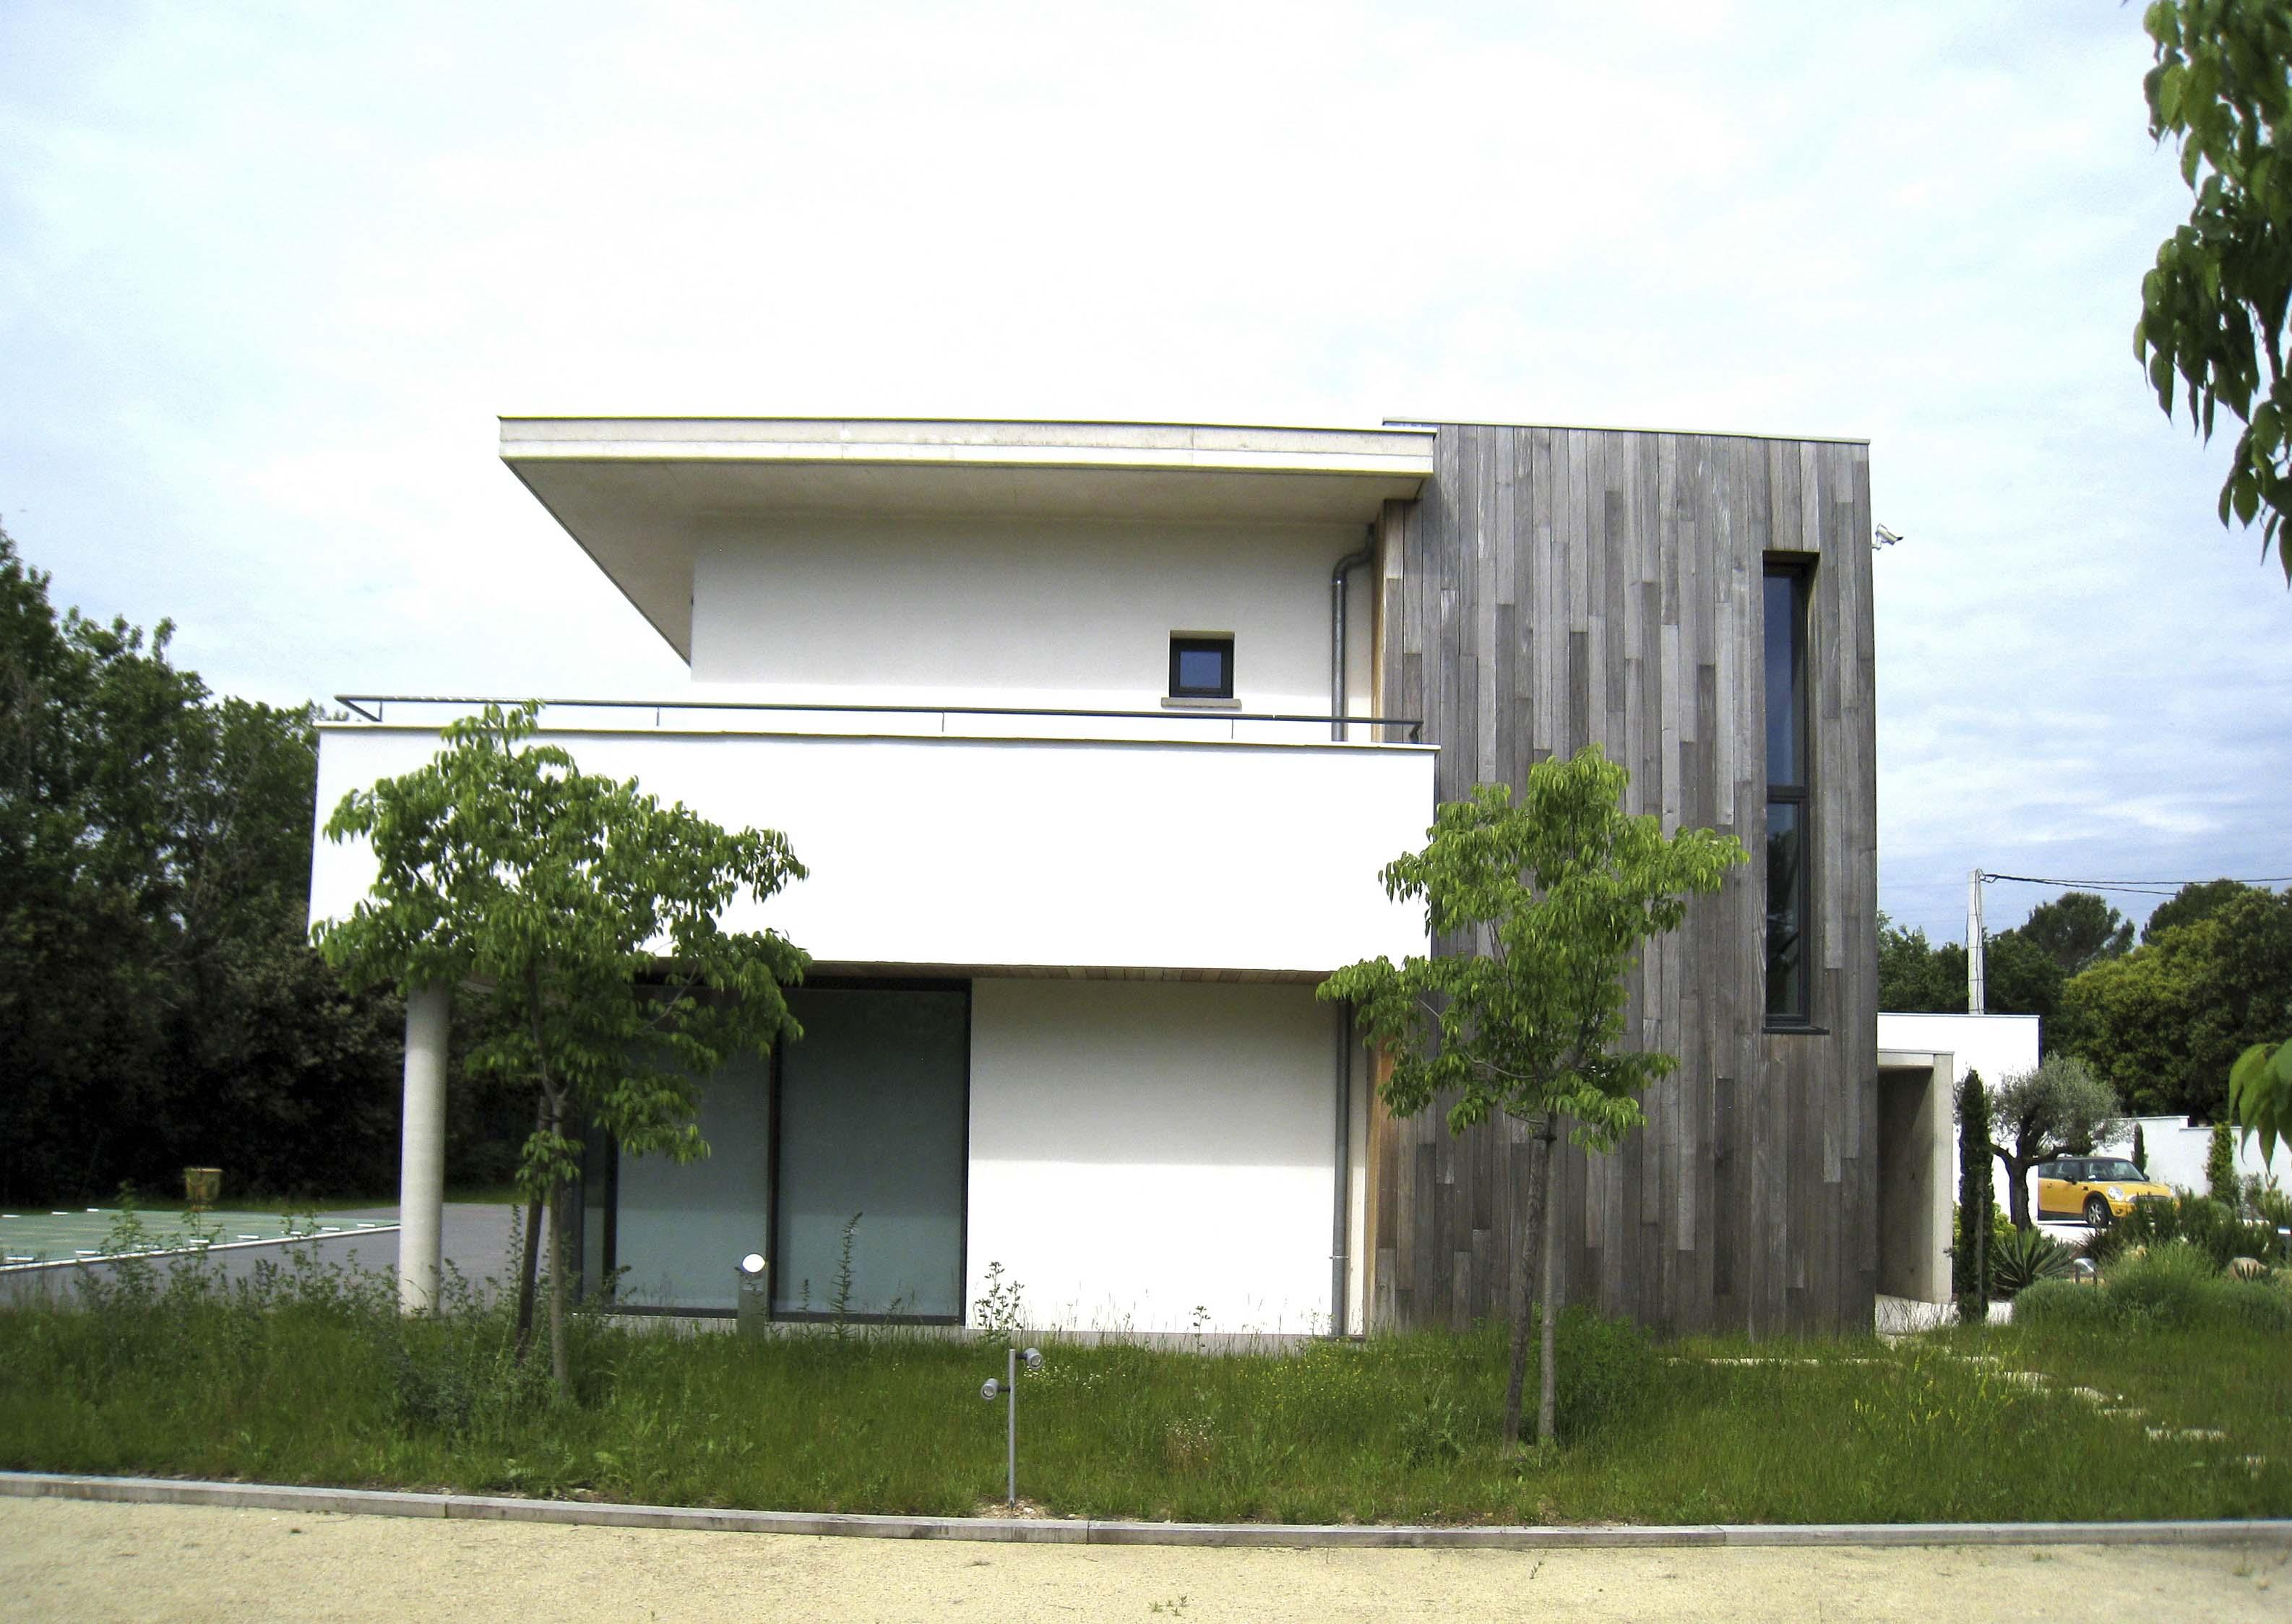 Maison individuelle Clermont Hérault BF Architecture 5